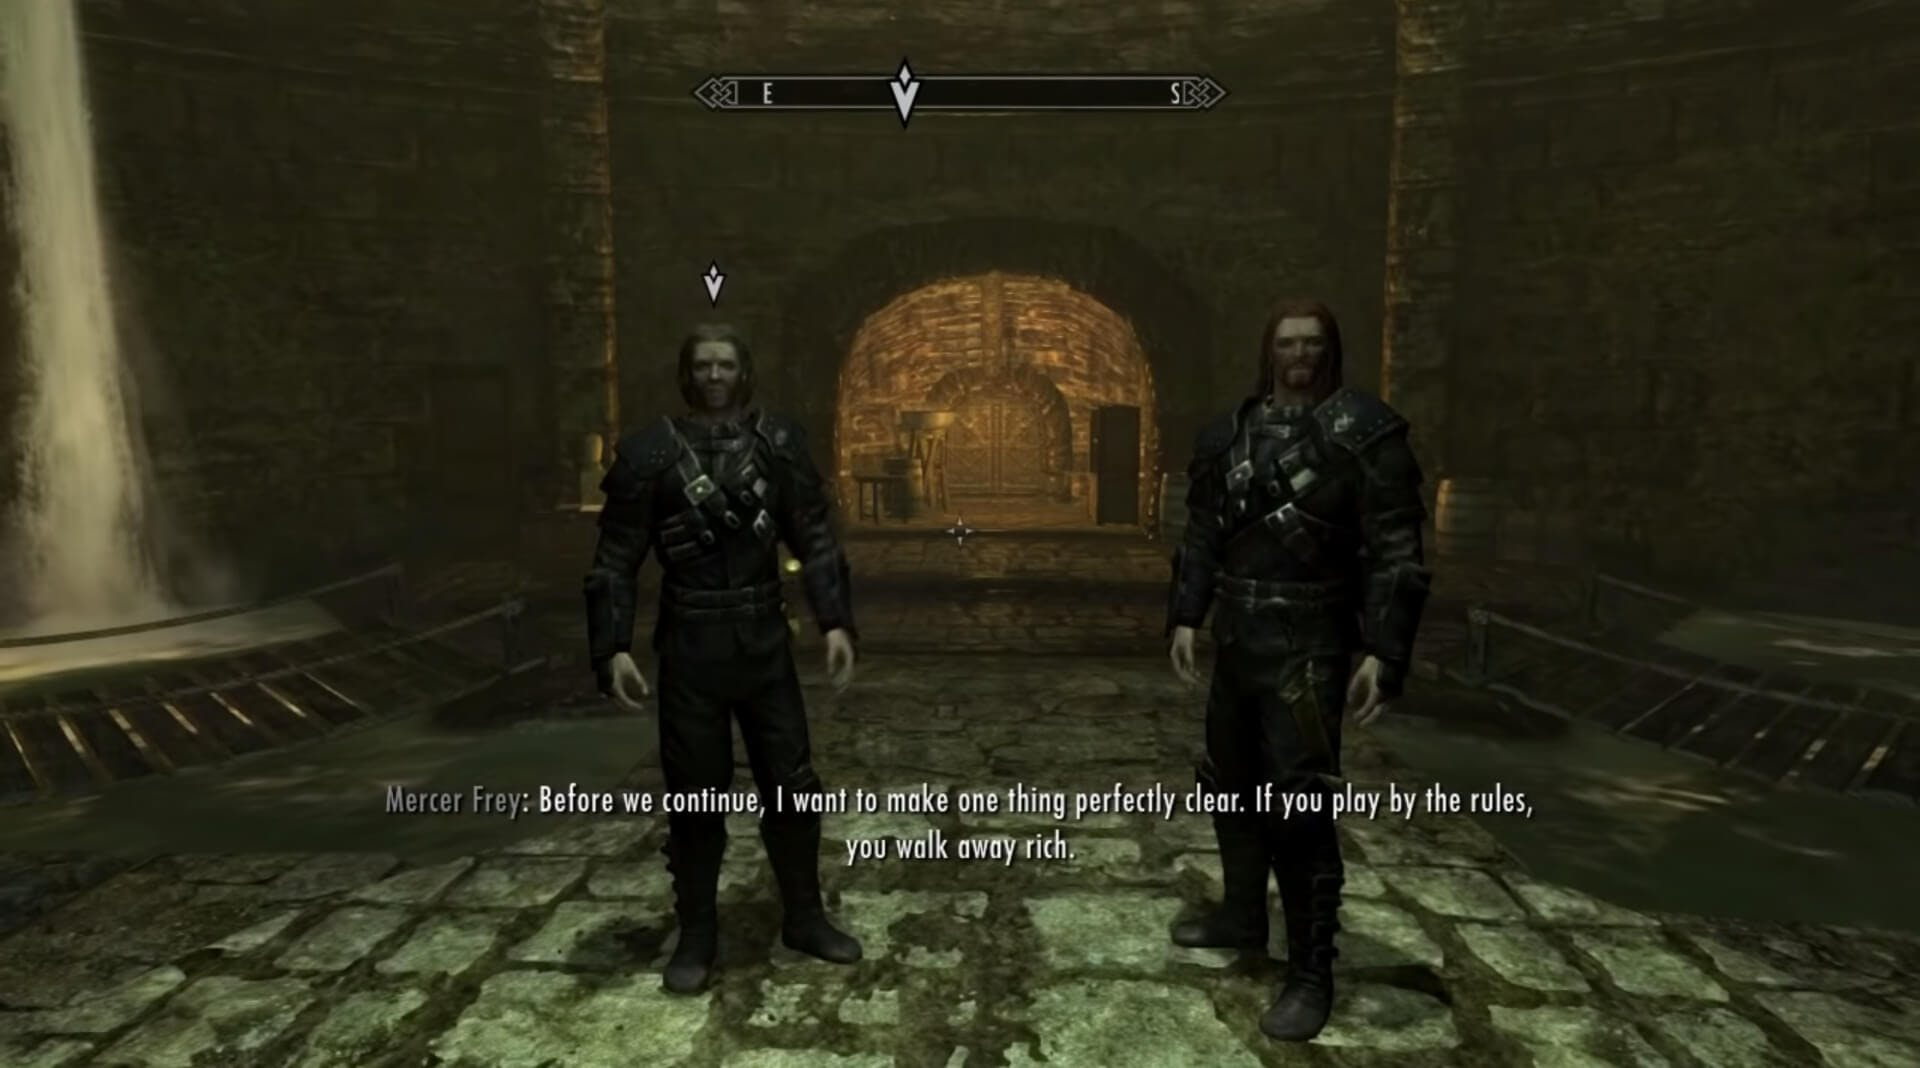 Skyrim - Thieves Guild